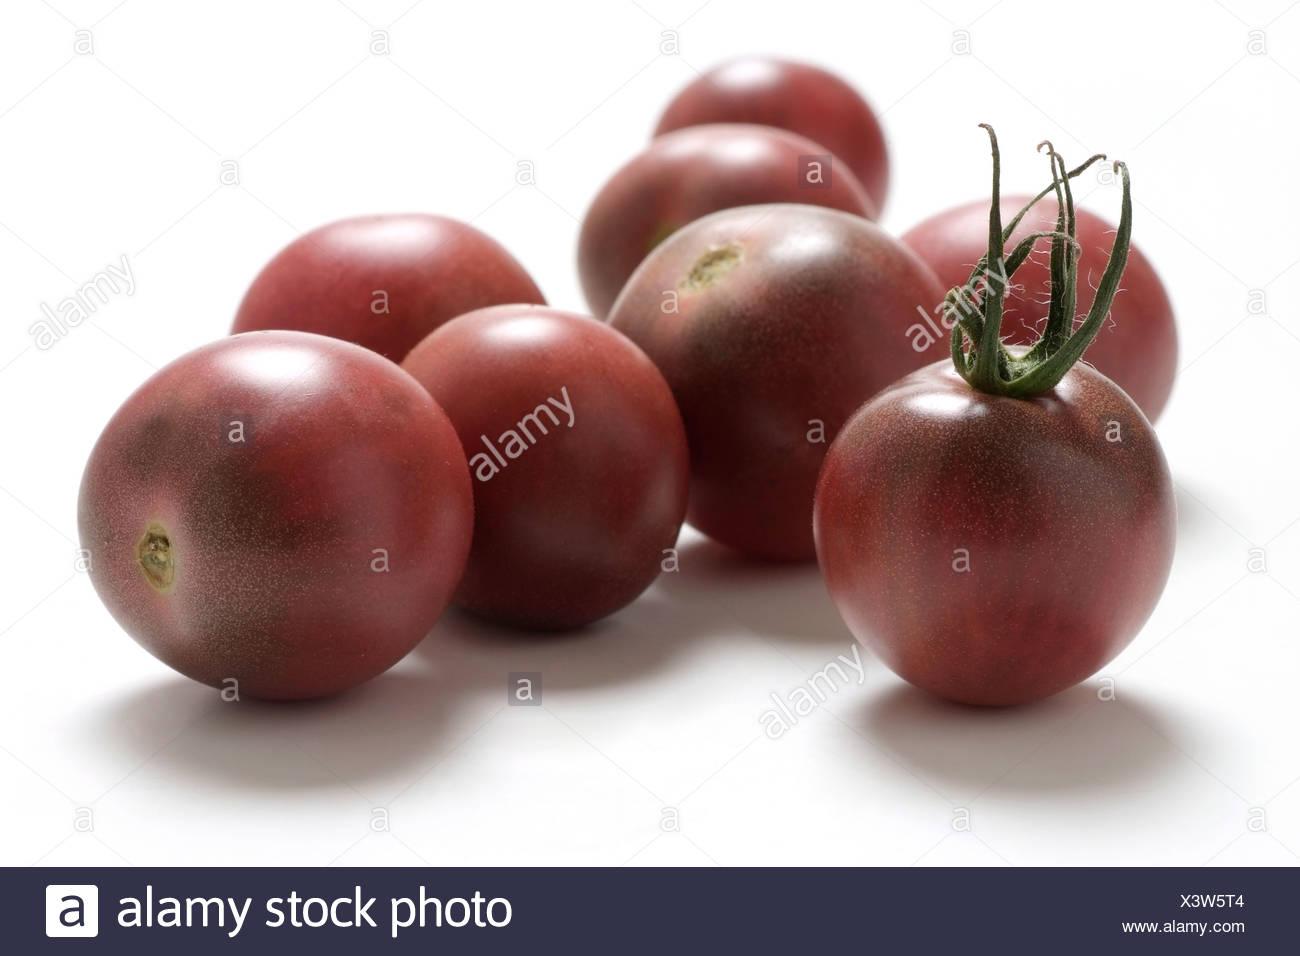 Tomato varieties: black cherry tomato - Stock Image